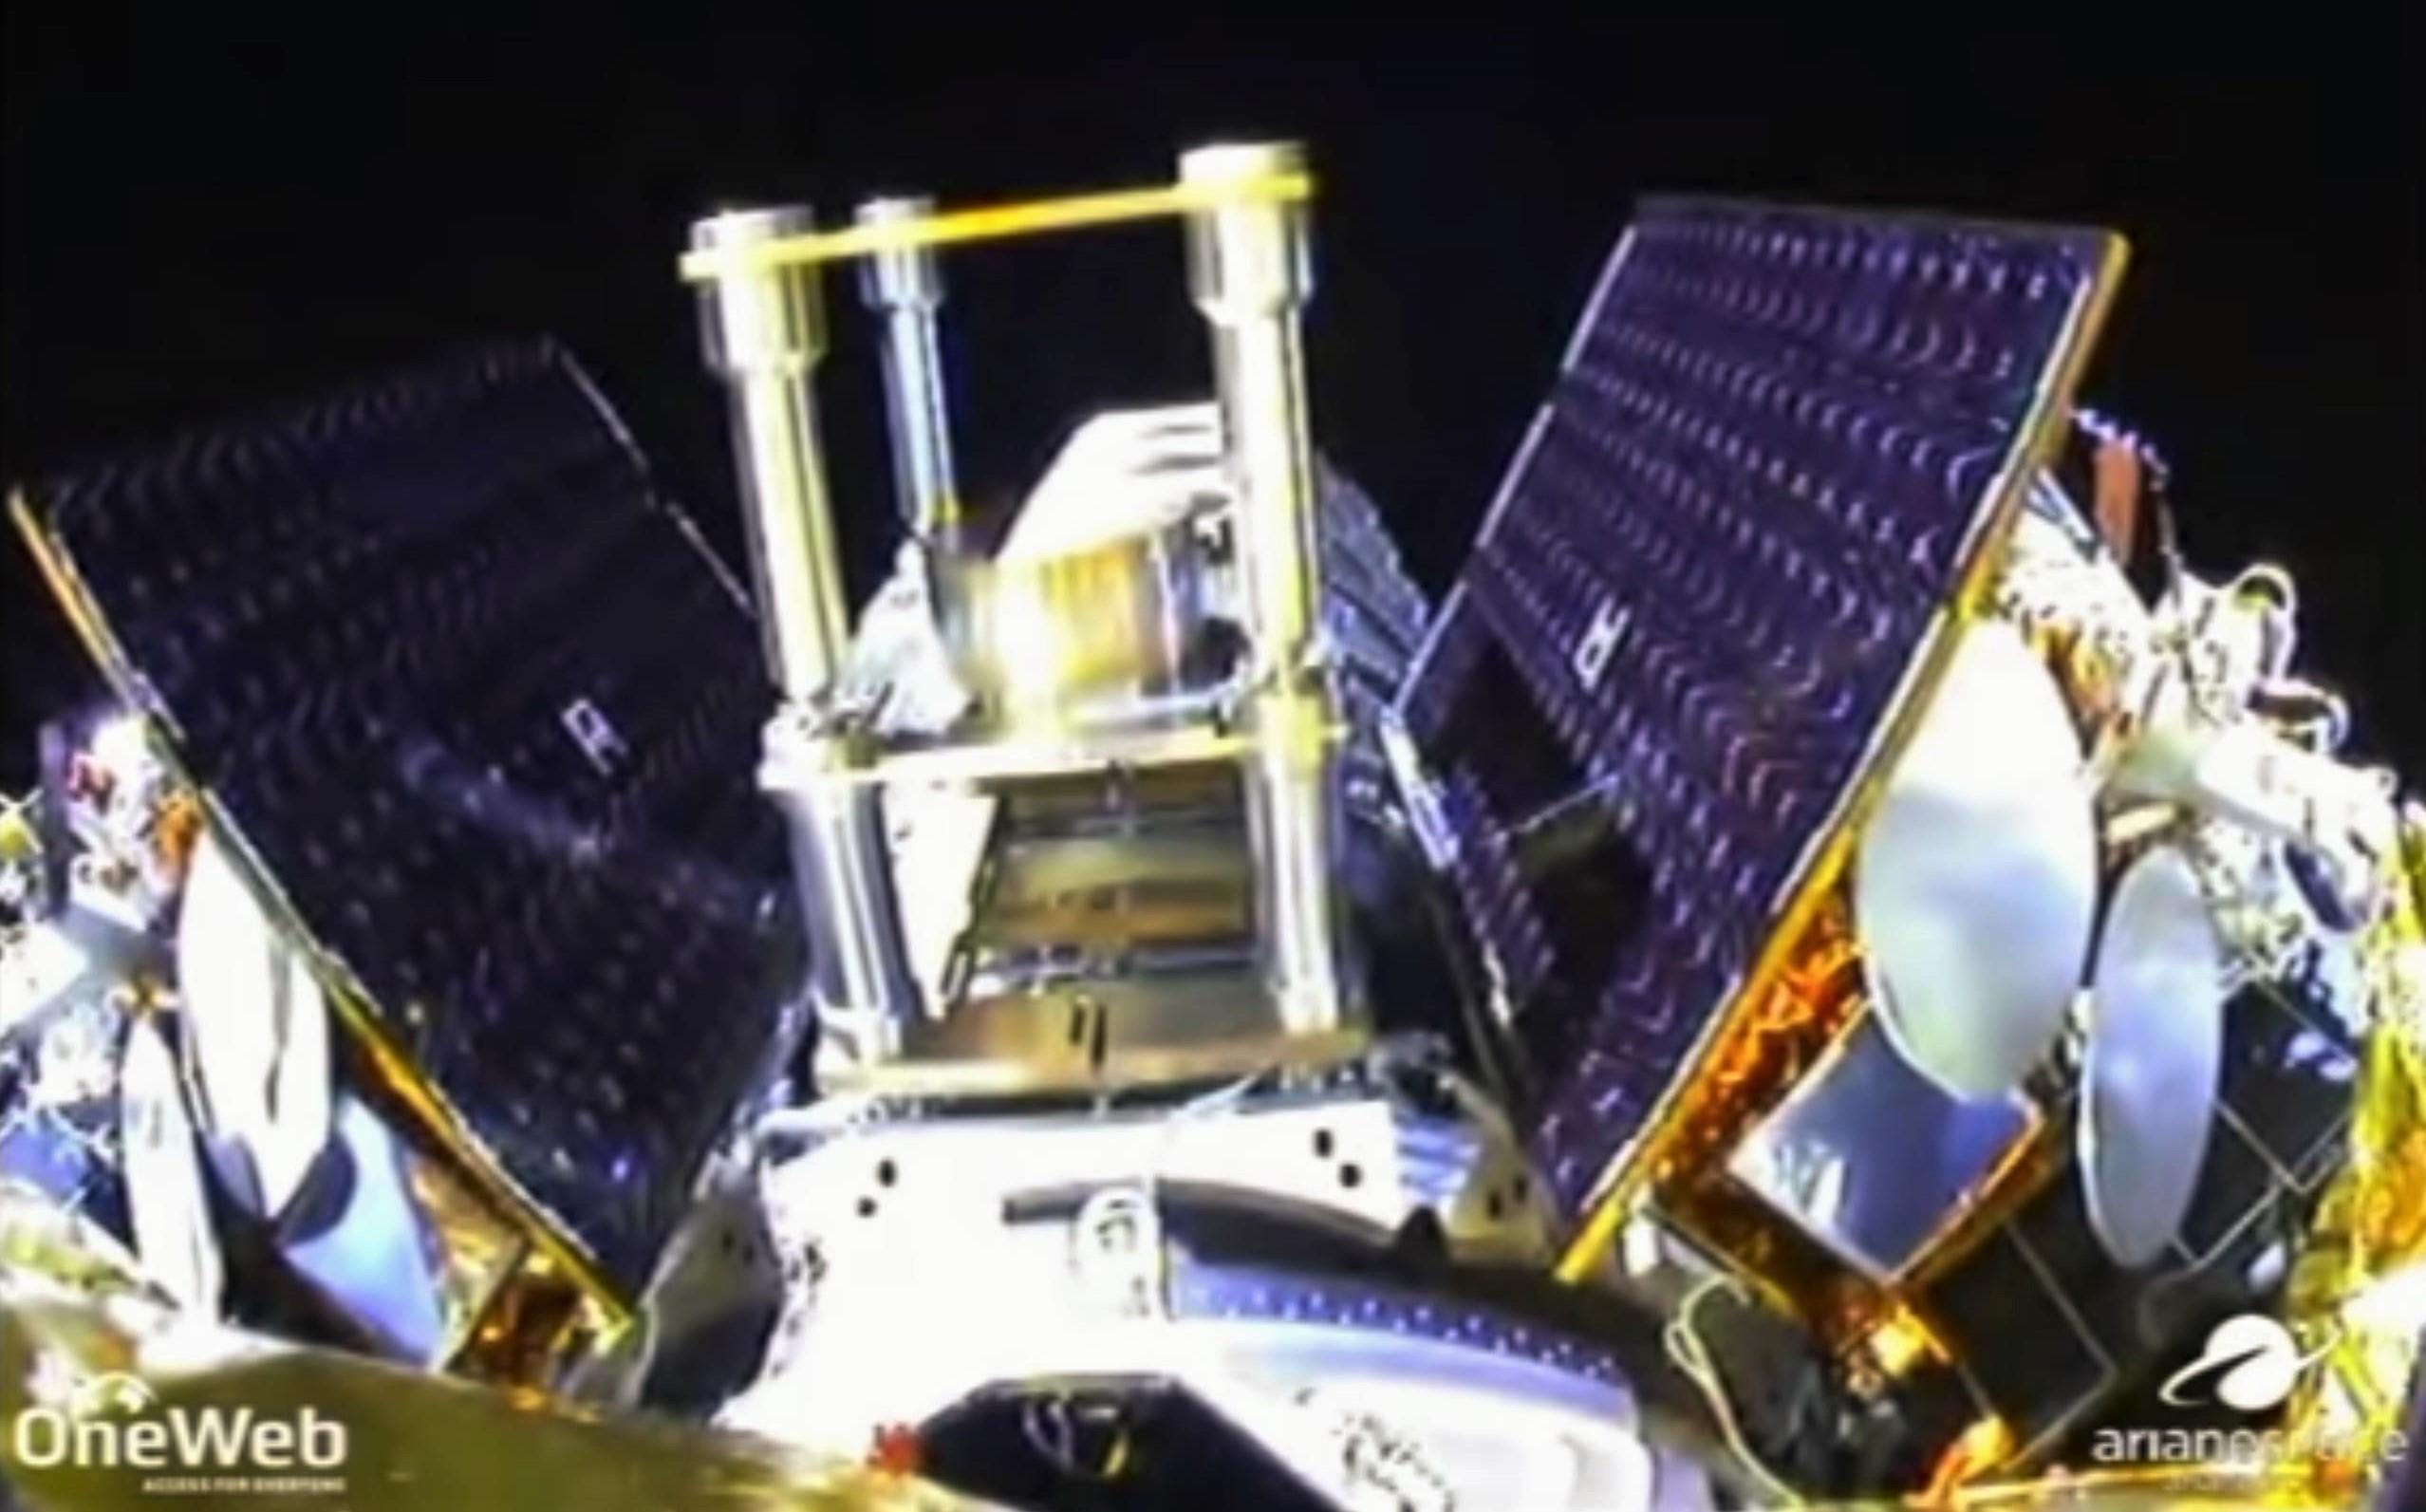 OneWeb satellite deployment Feb 2019 (Arianespace) 2